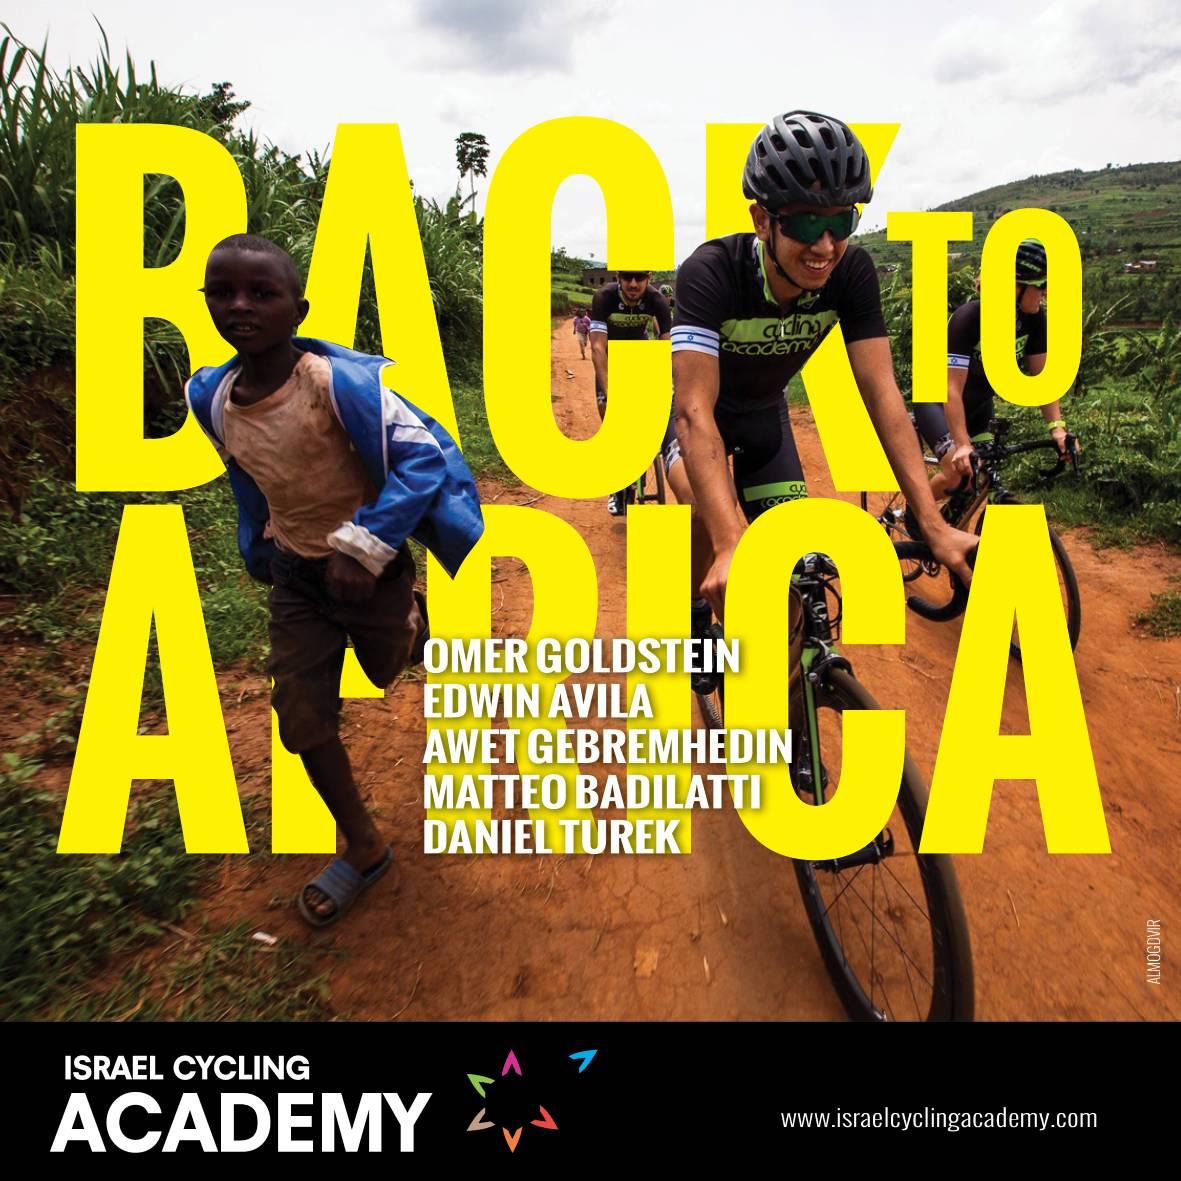 Back to Africa_rcz